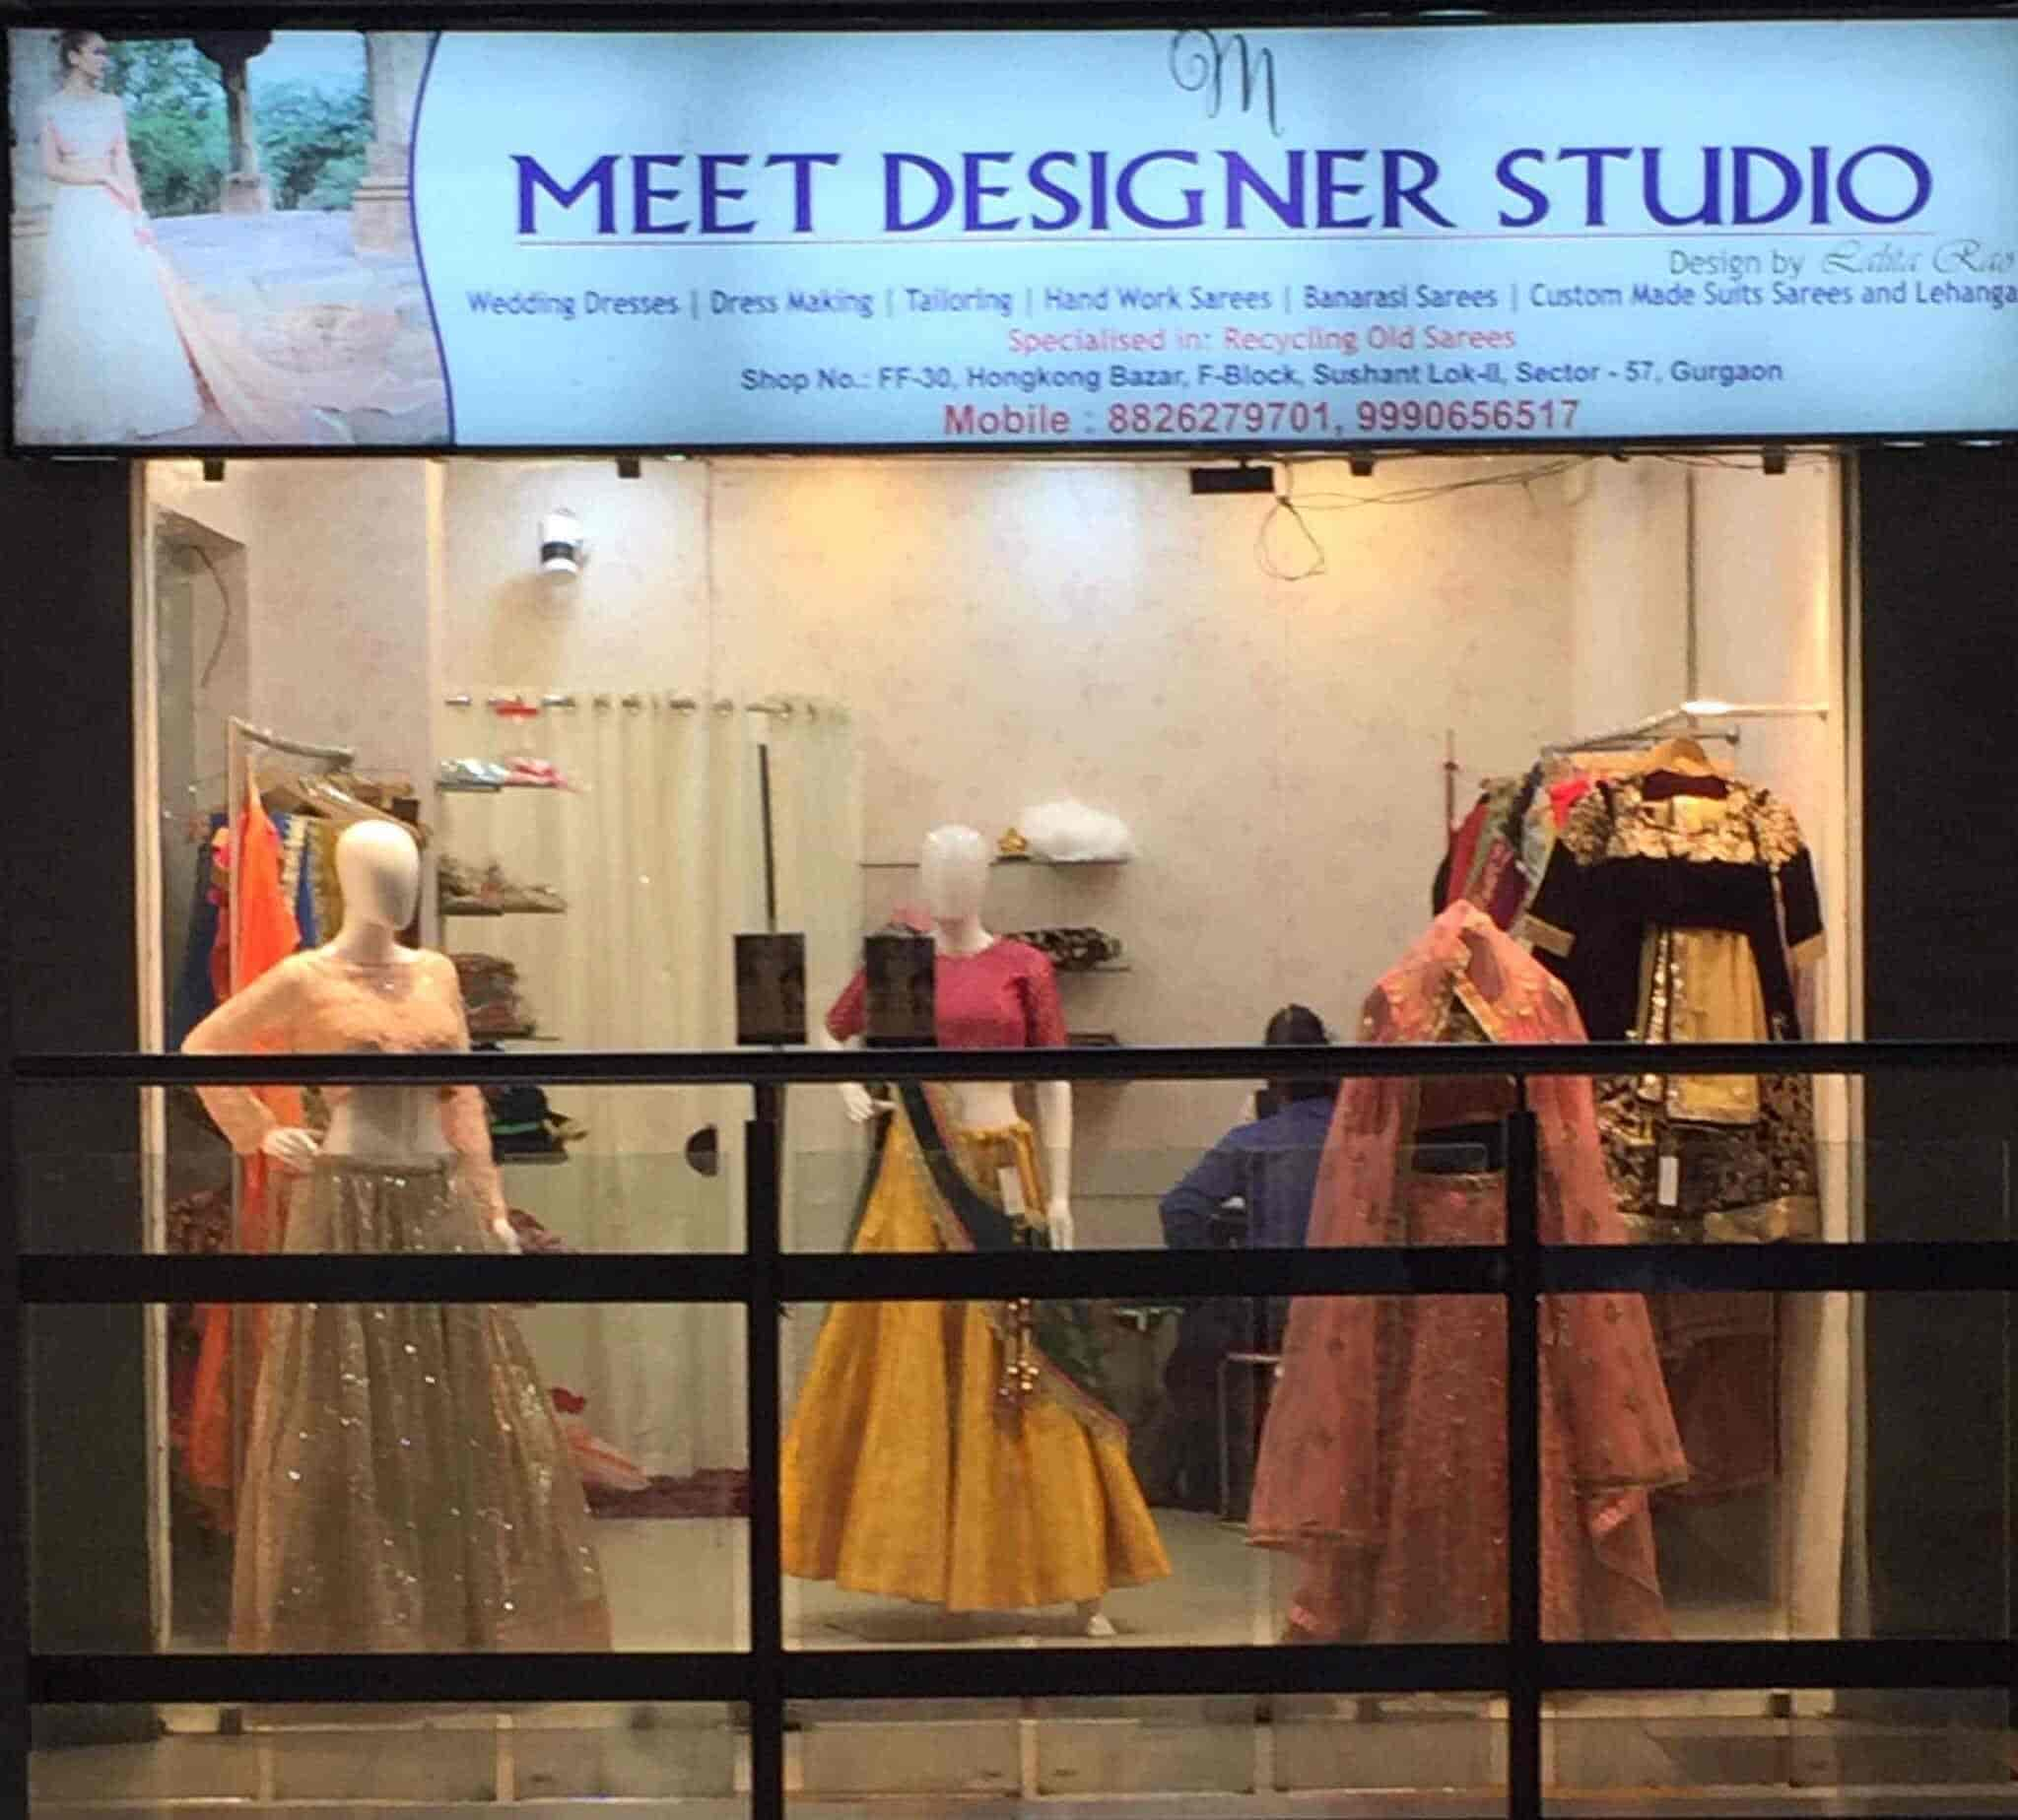 Meet Designer Studio Hong Kong Bazar Gurgaon Sector 57 Boutiques In Gurgaon Delhi Justdial